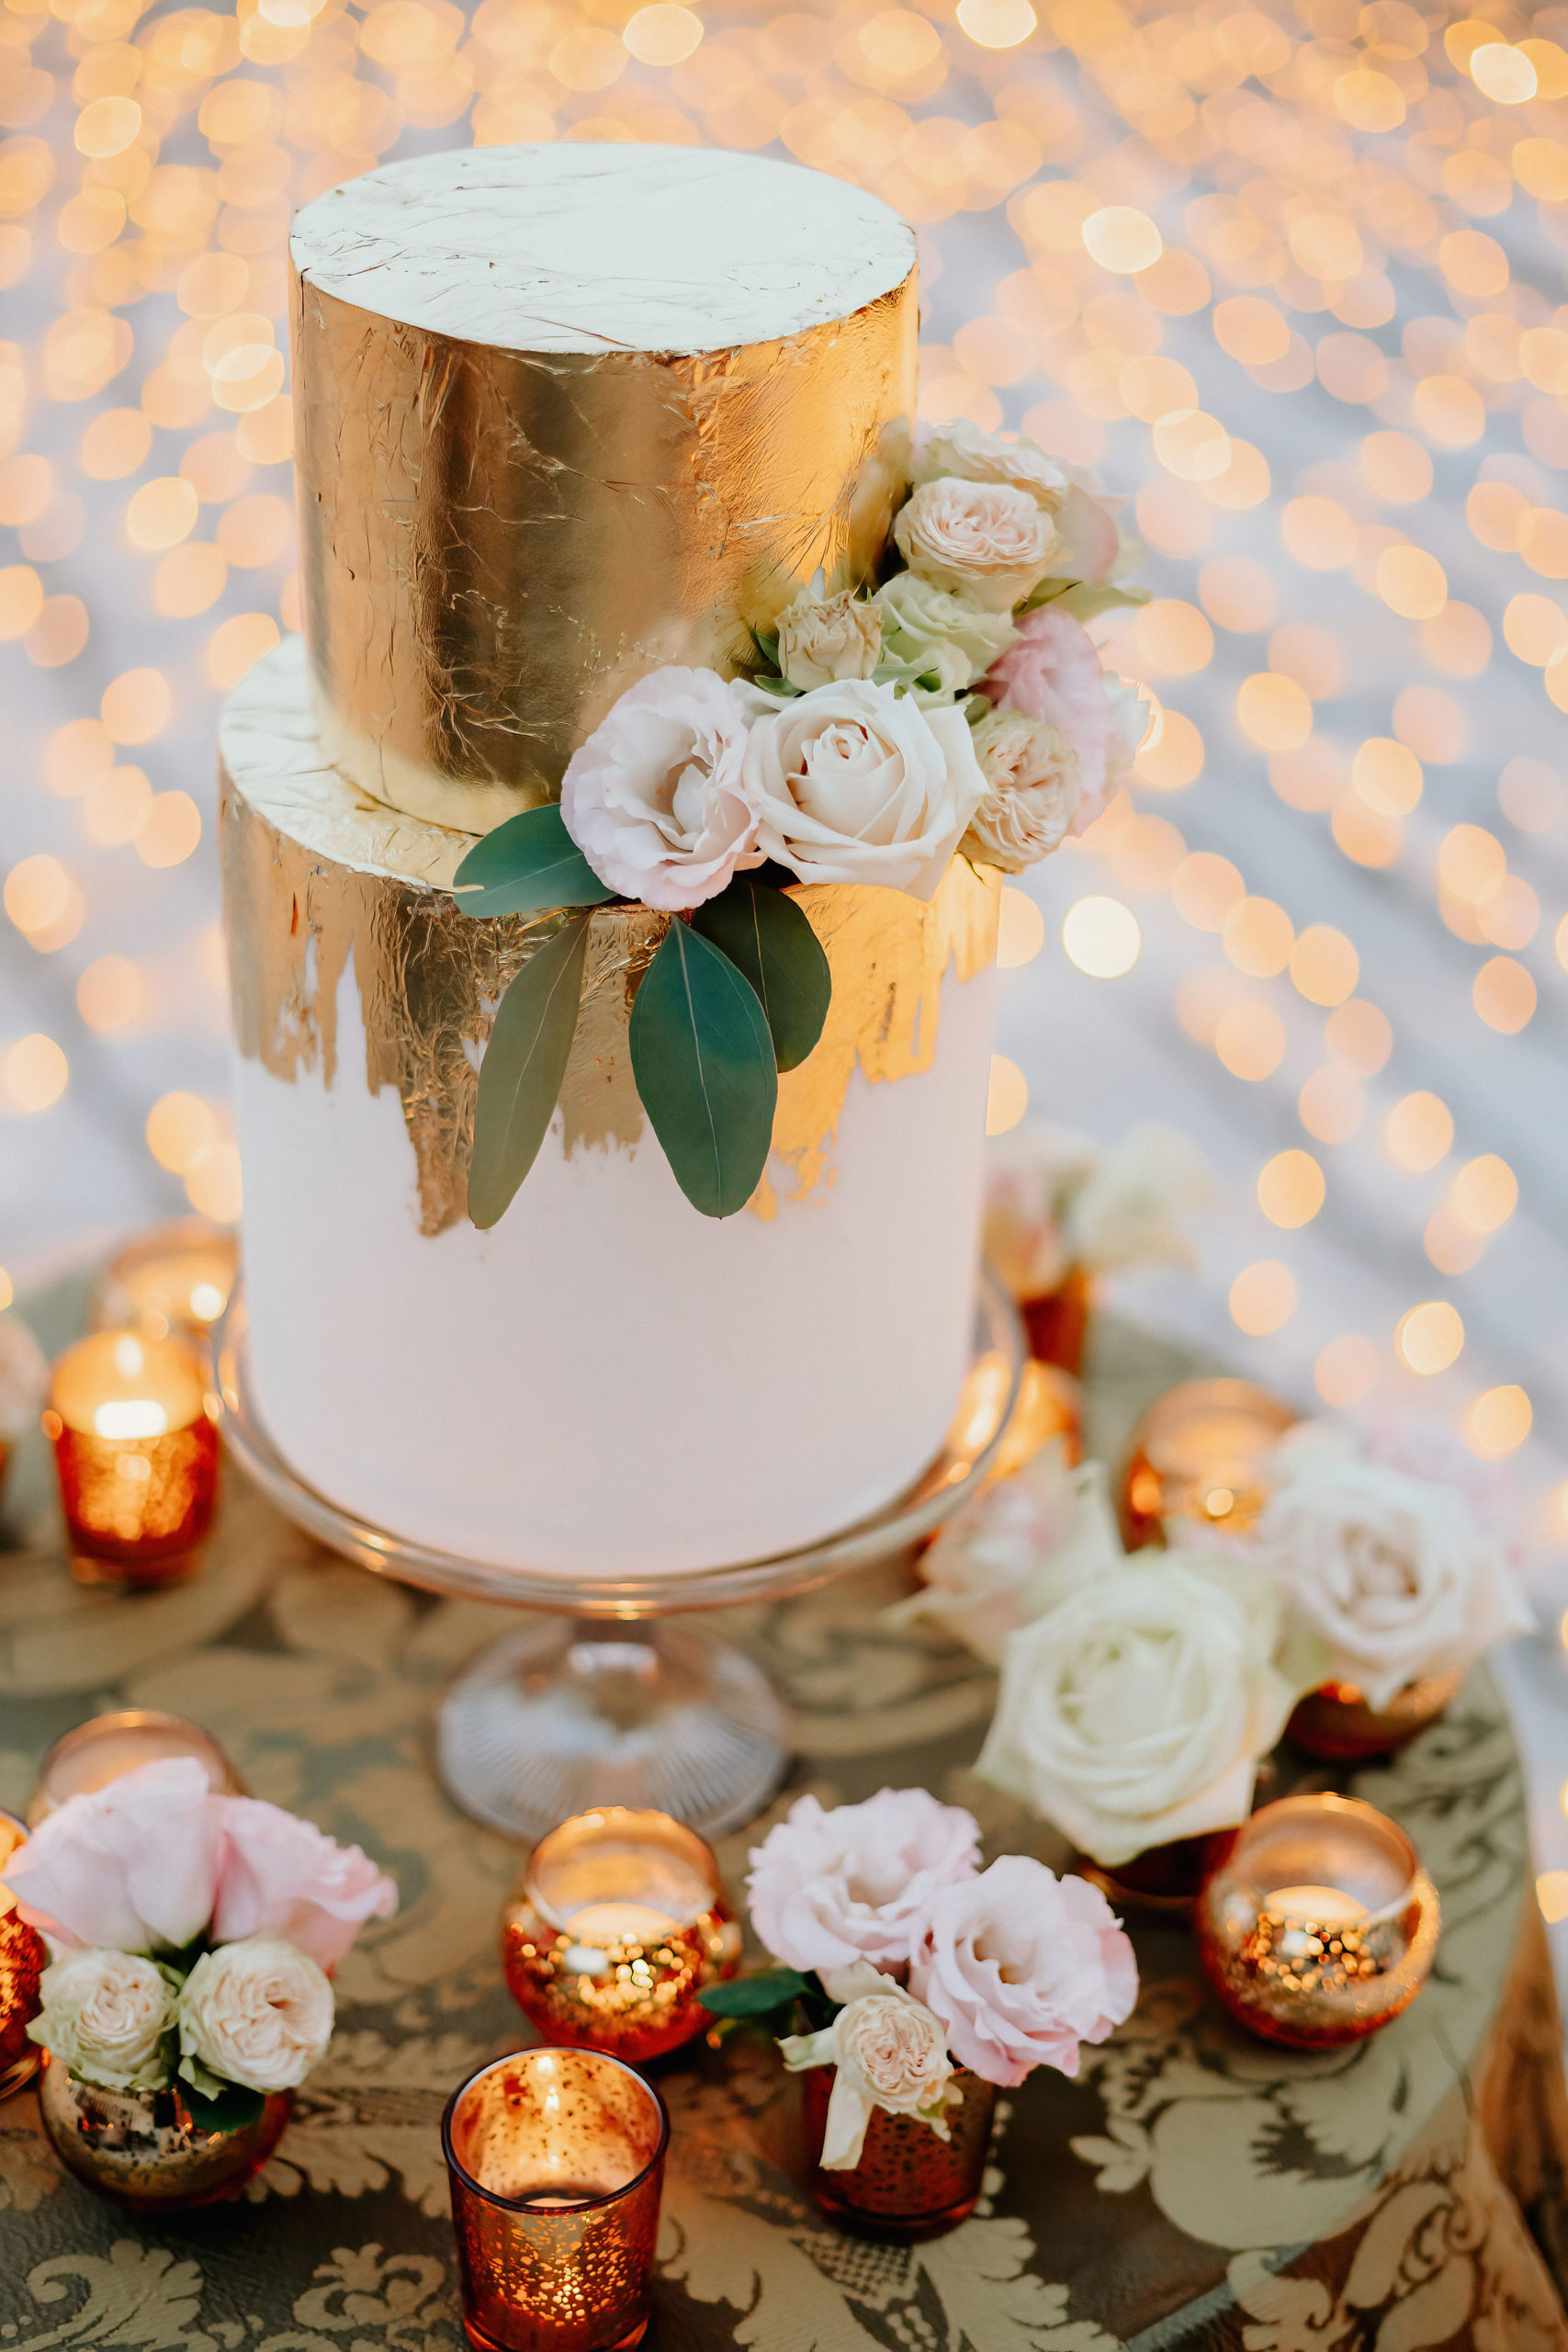 wedding ake oro rose fiori candele venezia